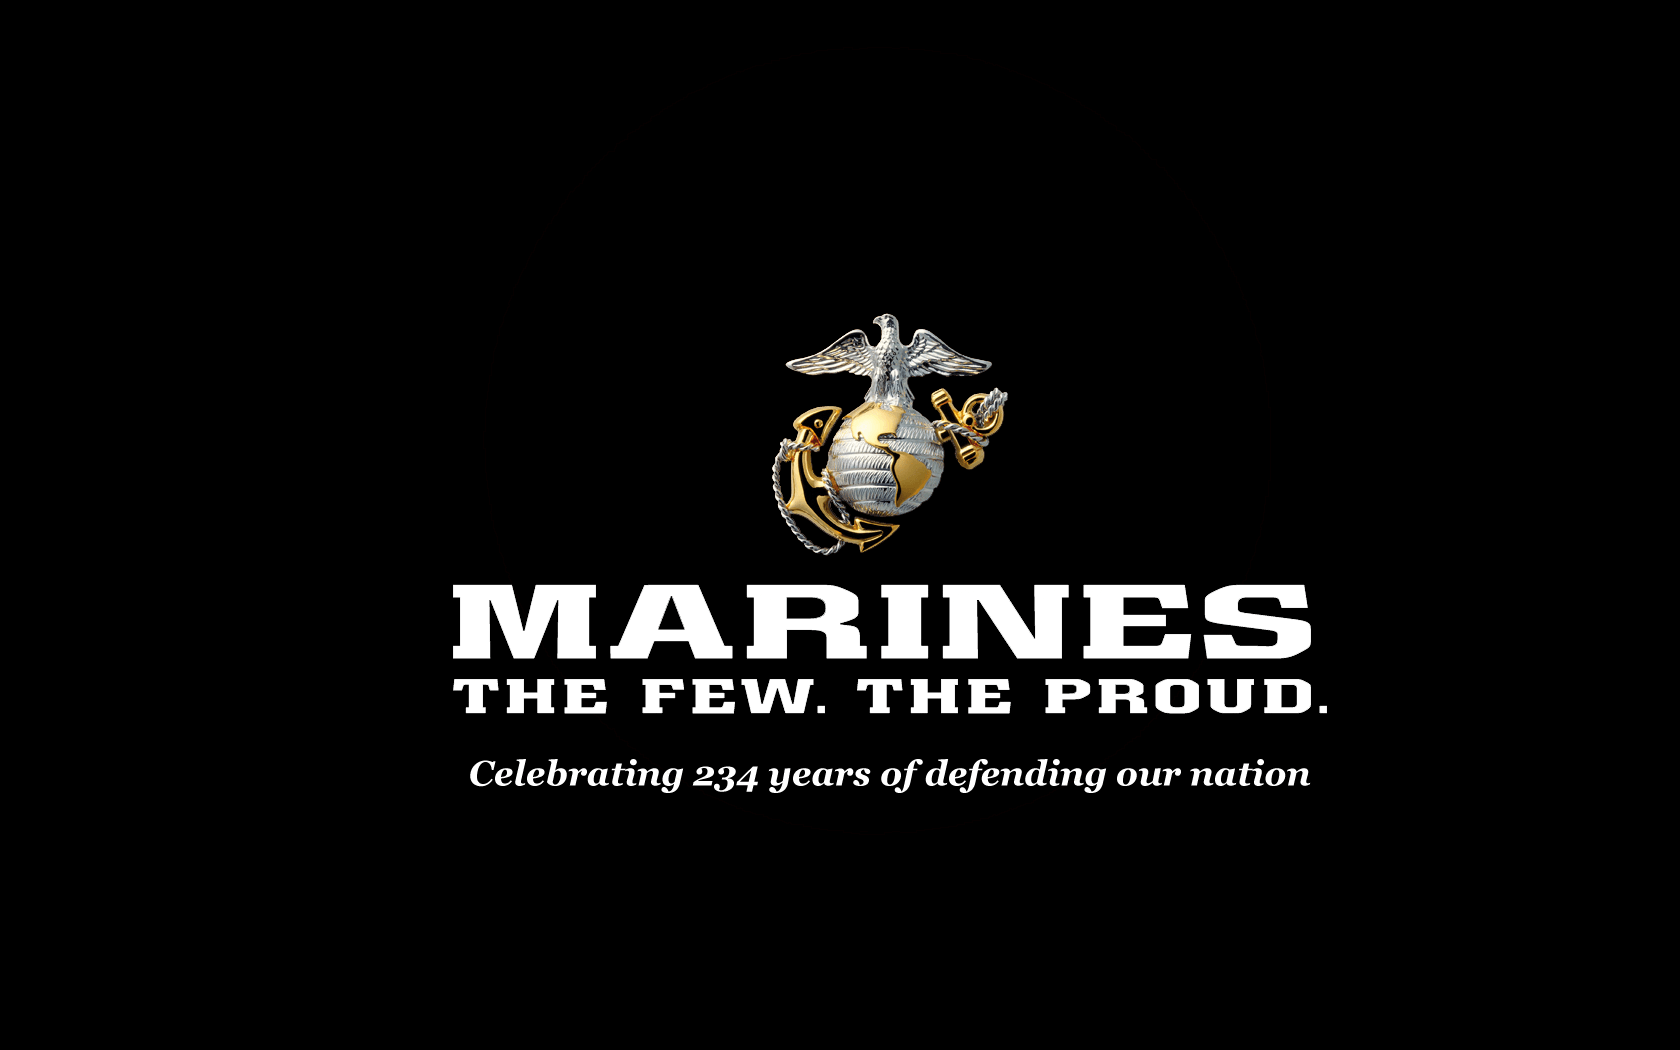 marine logo wallpaper 04 - photo #28